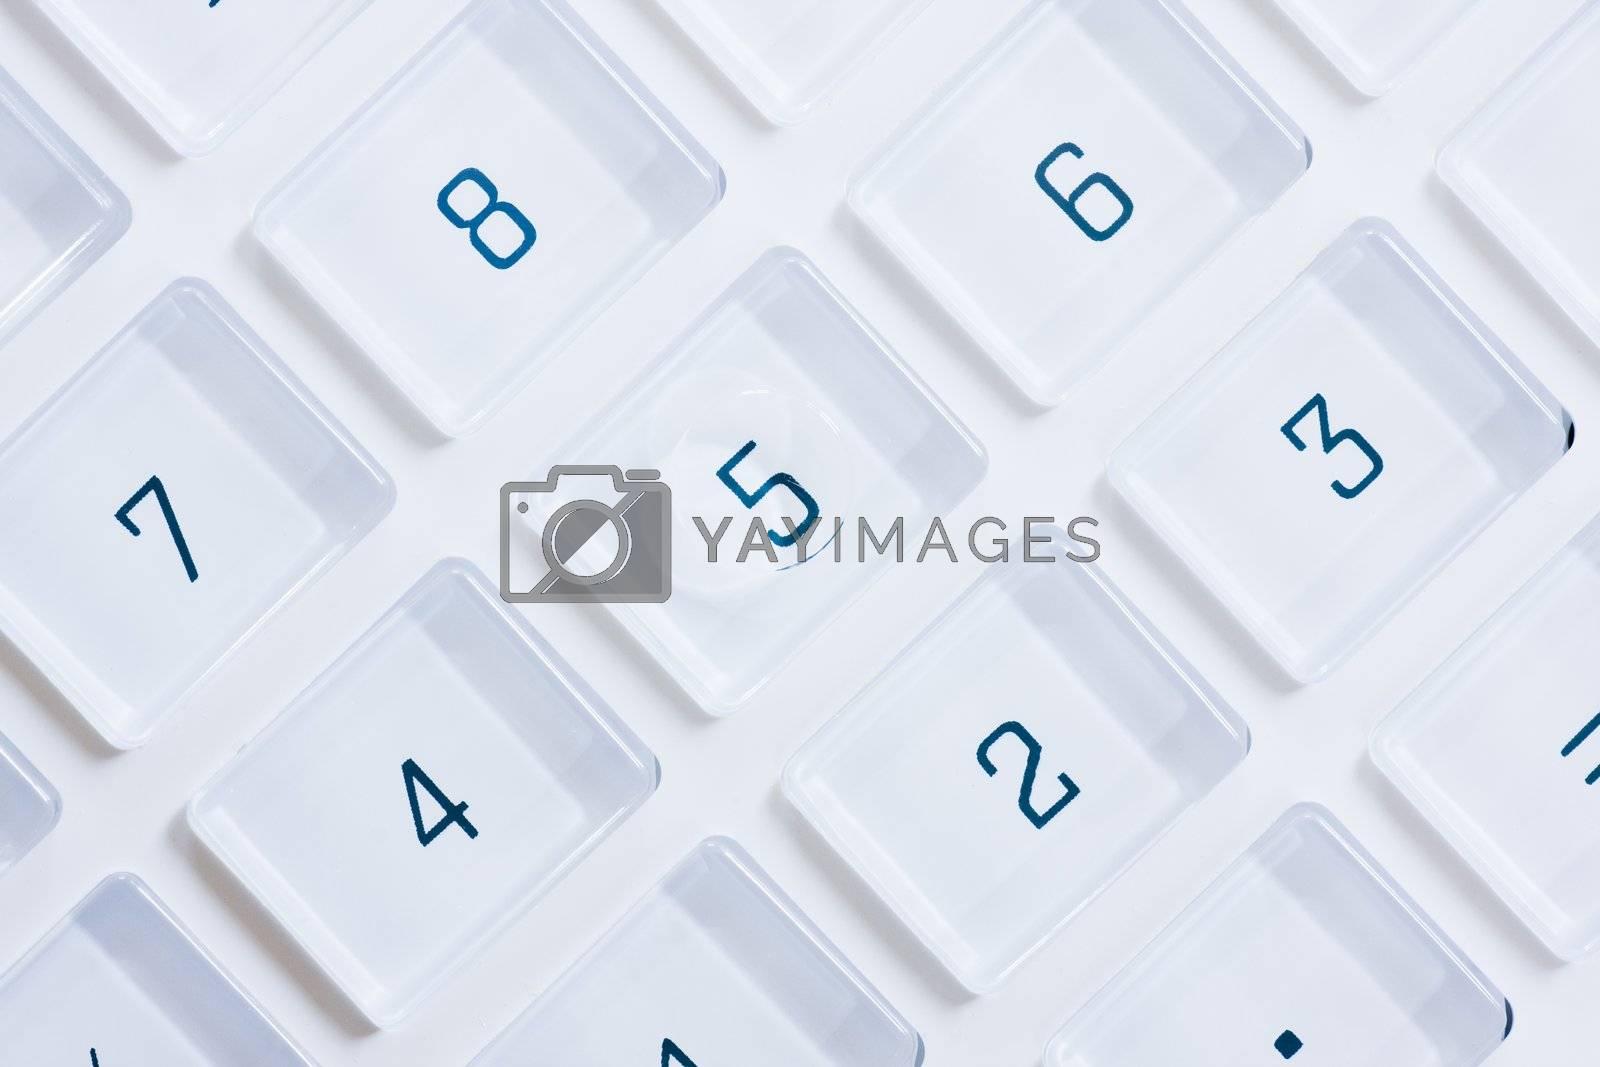 Keys of a calculator by ArtmannWitte